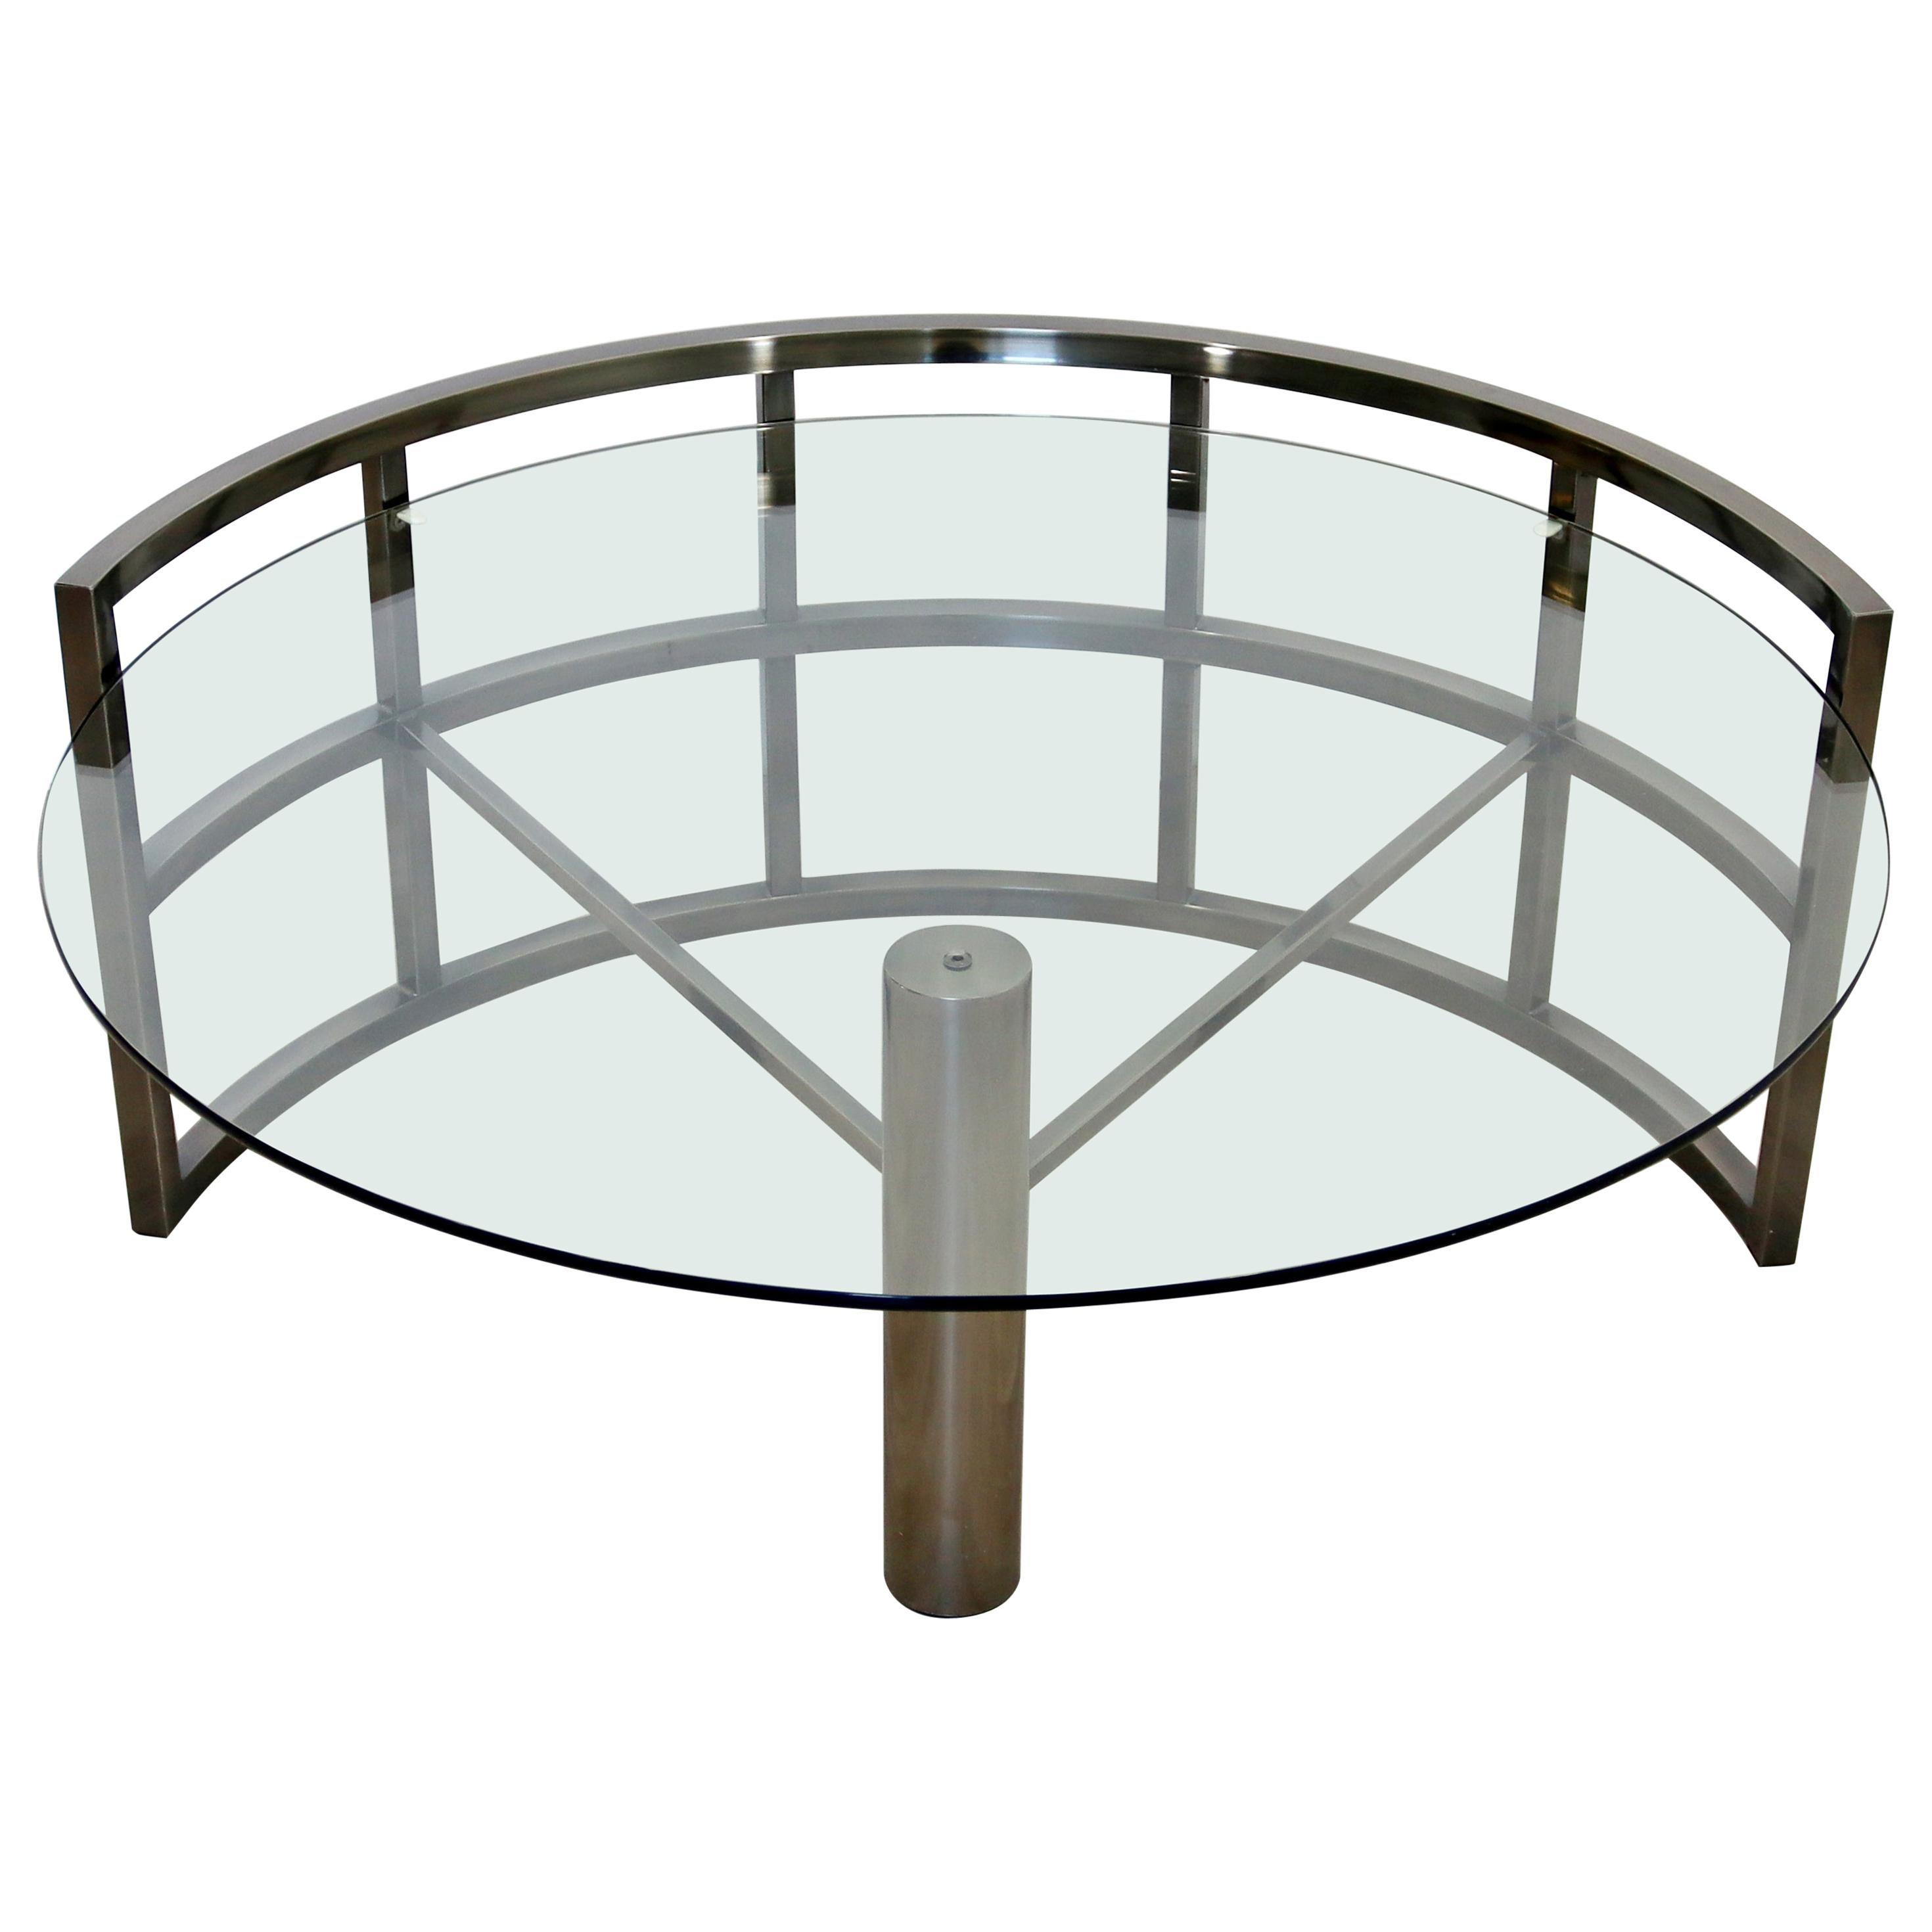 Contemporary Modern Brueton Style Asymmetrical Glass Gunmetal Coffee Table 1980s